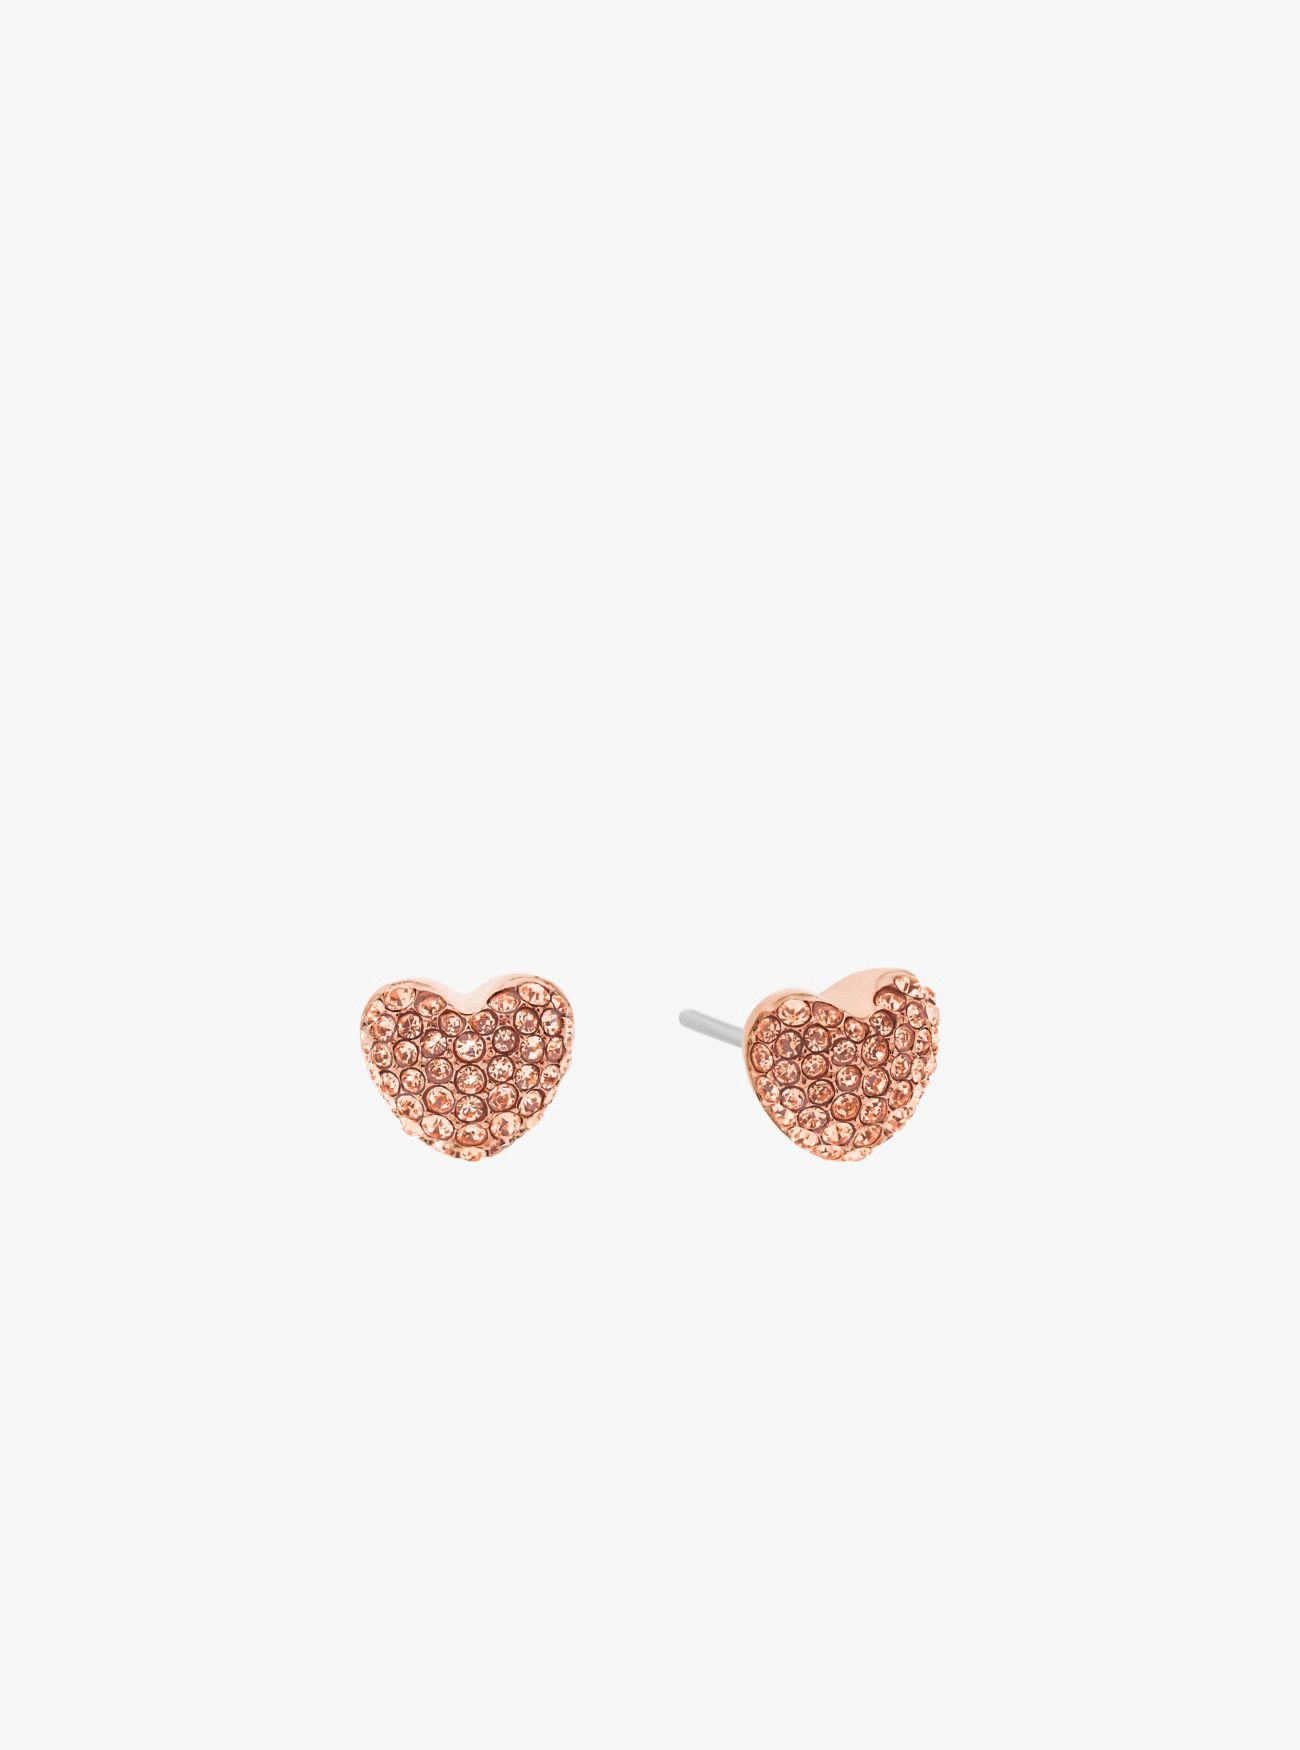 98aa93107c6d1 MICHAEL KORS Pavé Rose Gold-Tone Heart Stud Earrings.  michaelkors  all